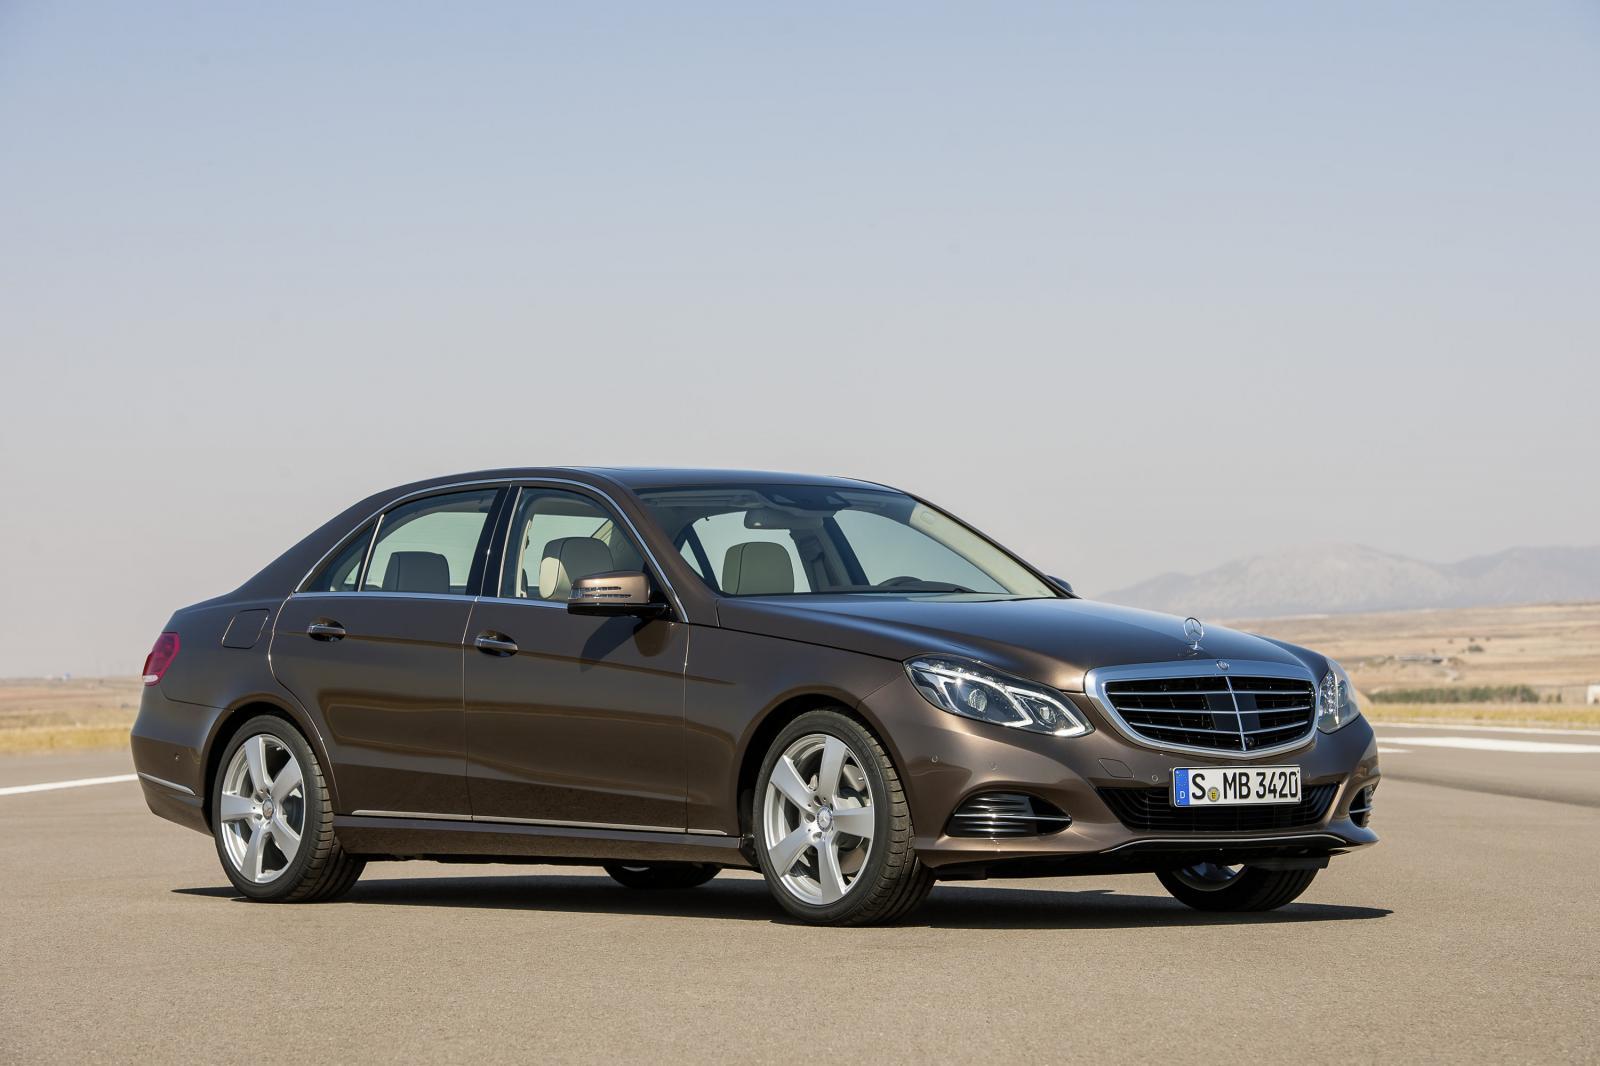 Mercedes e300 bluetec hybrid diesel coming to australia for Mercedes benz e300 hybrid